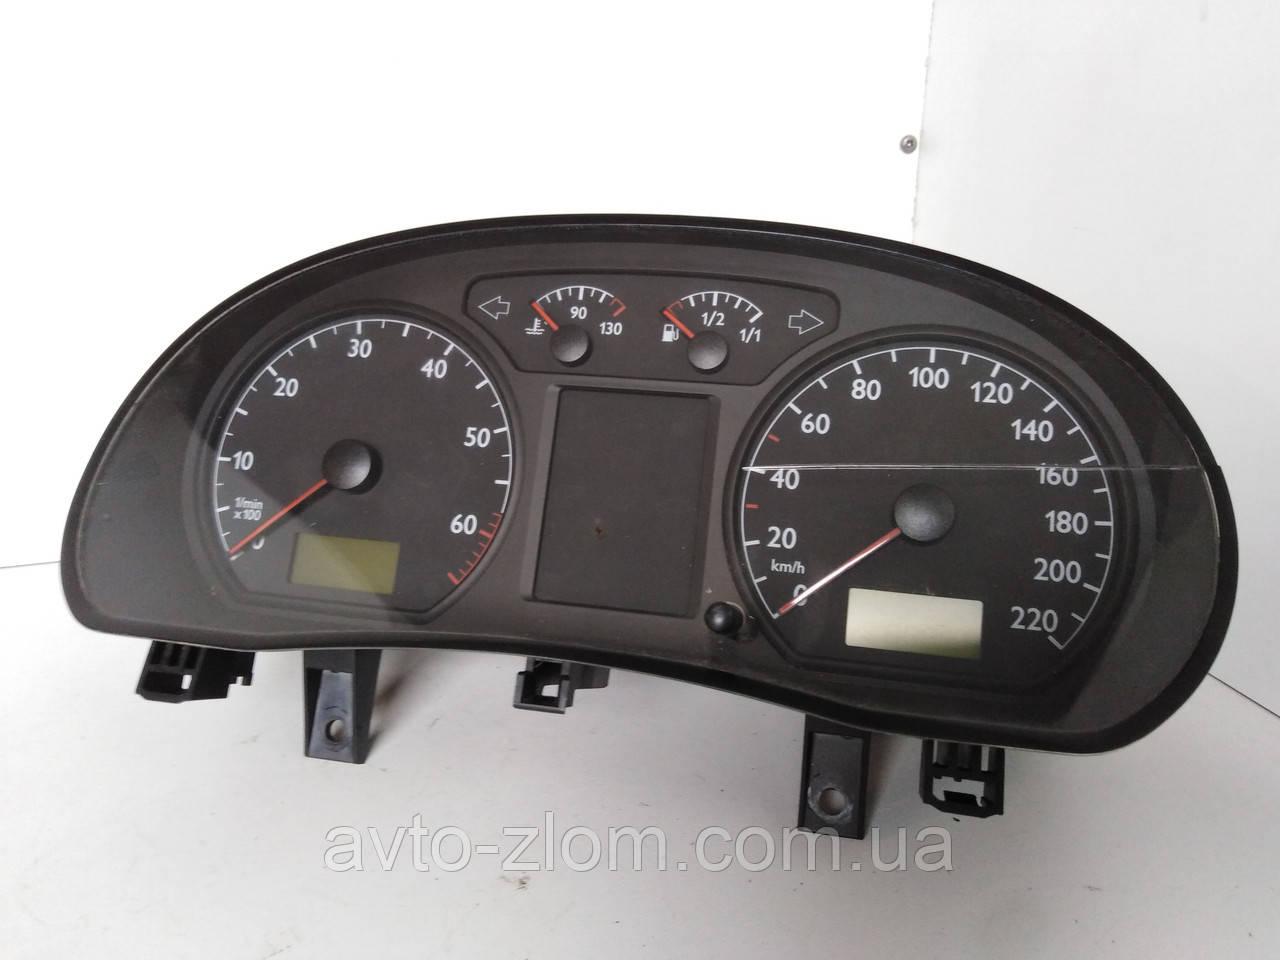 Щиток, панель приборов Volkswagen Polo 9N, Поло. 6Q0920800P.